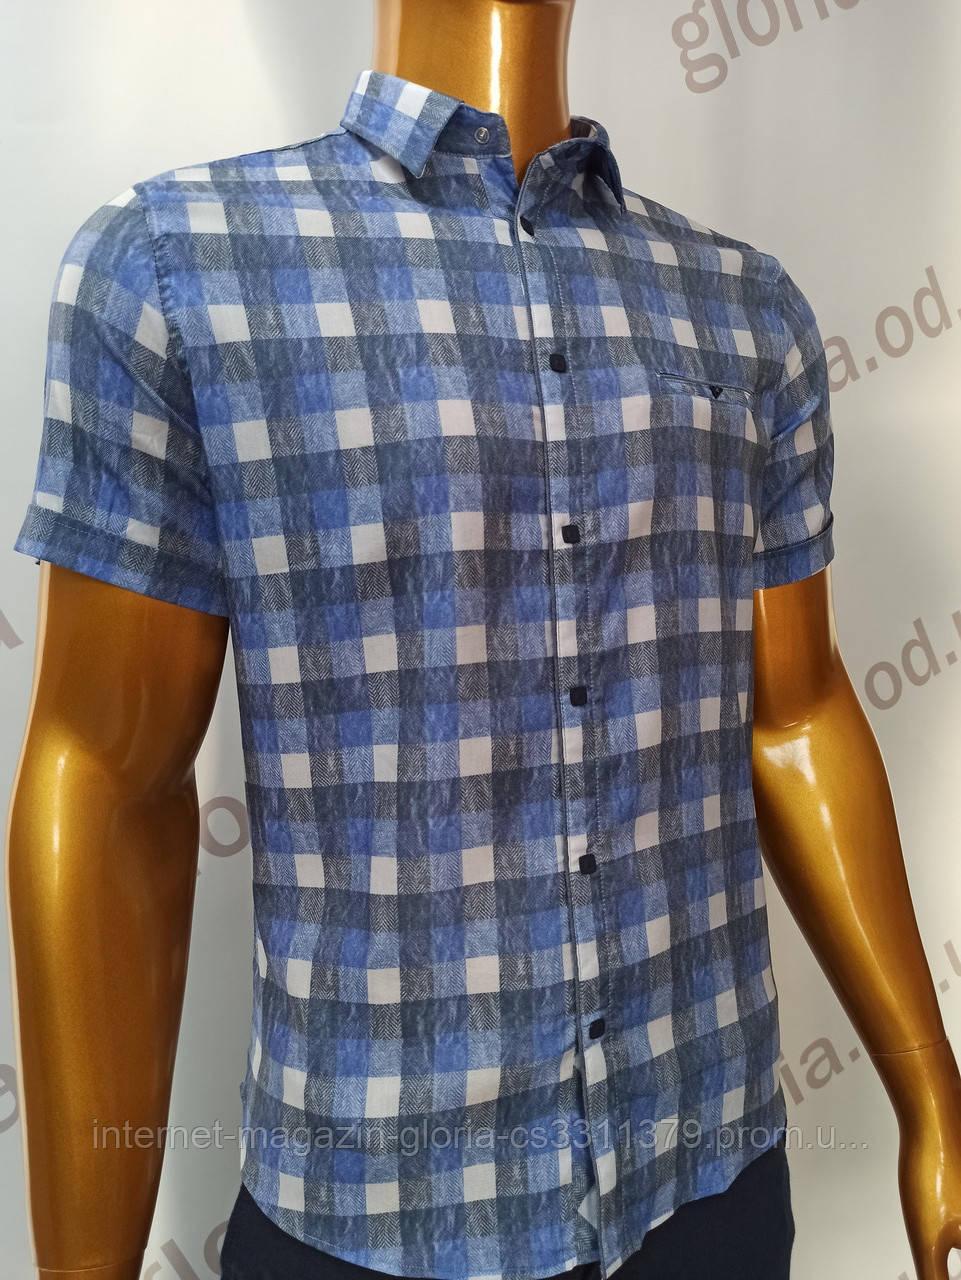 Мужская рубашка Amato. AG.KG19585(g). Размеры: L,XL(2),XXL.